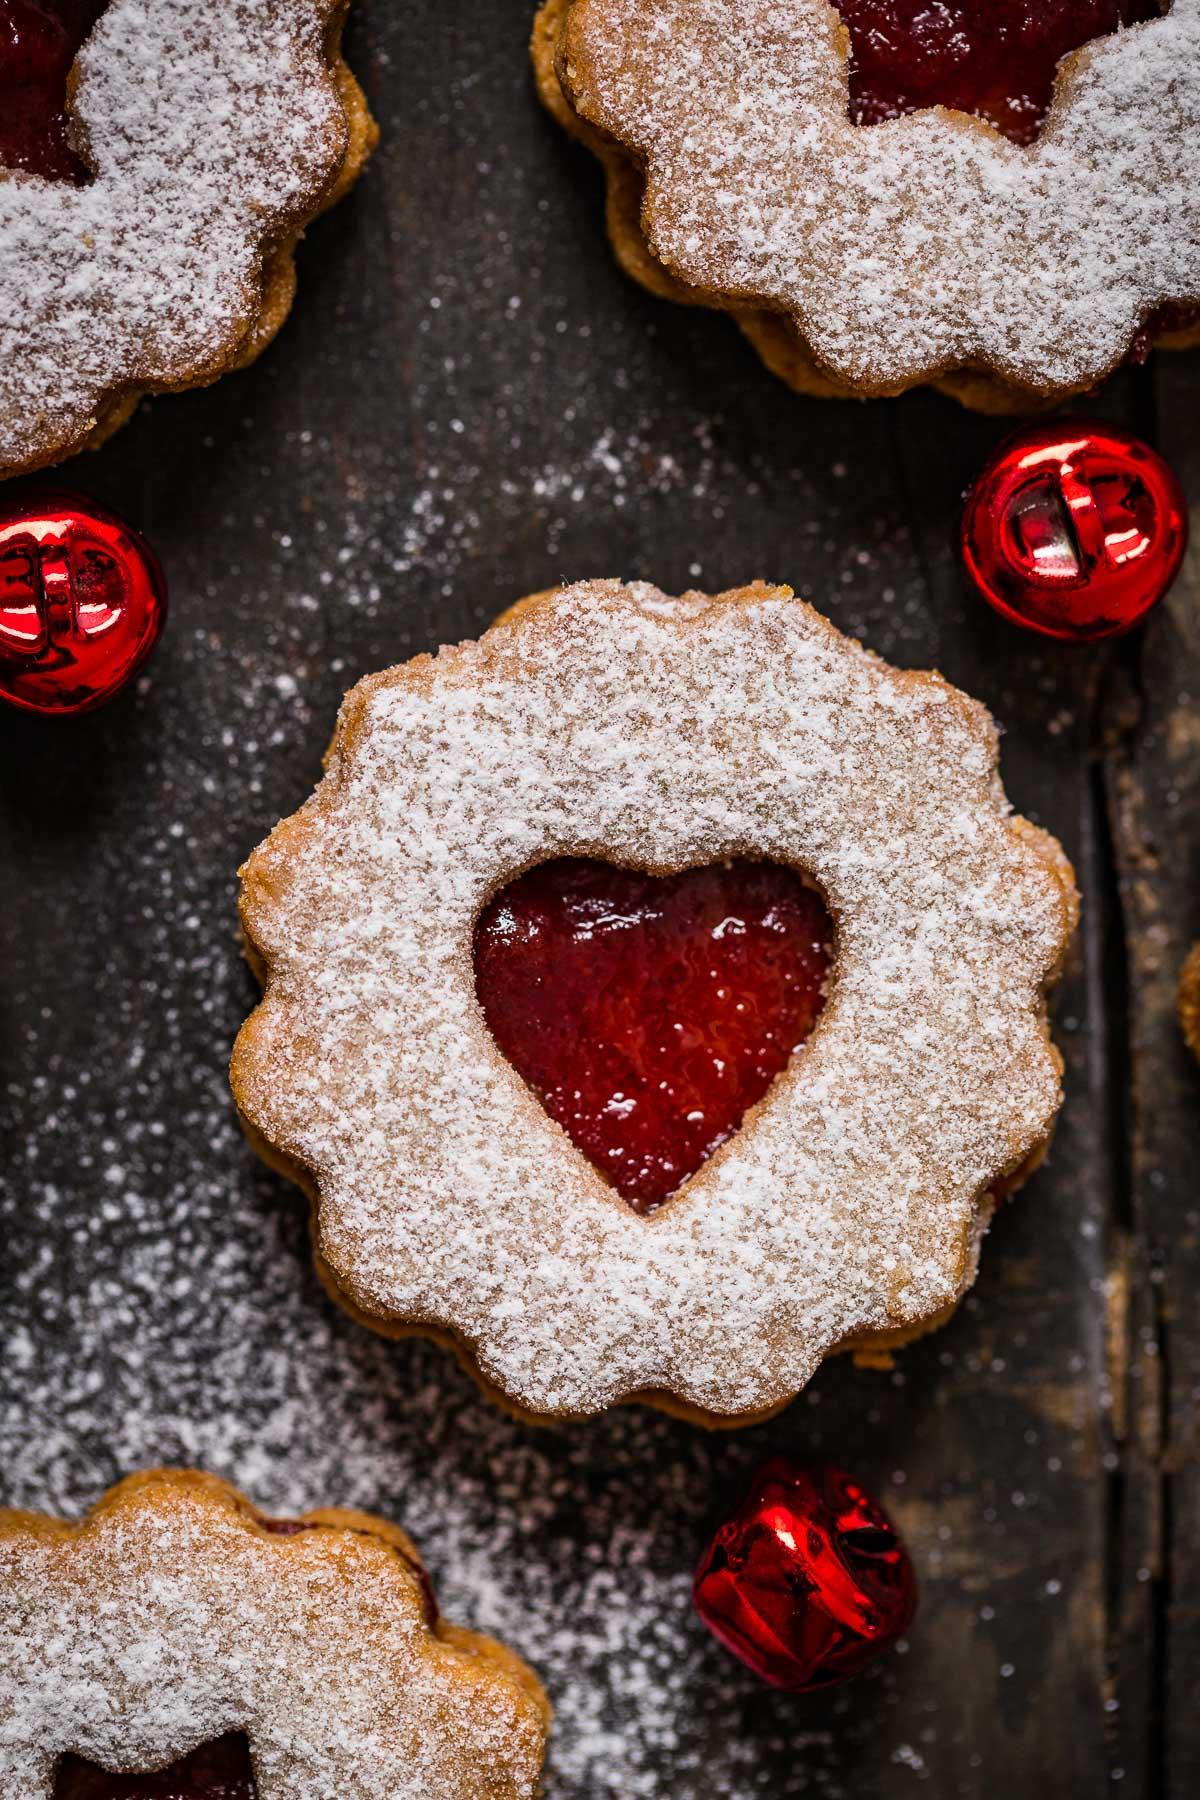 ricetta originale BISCOTTI LINZER VEGANI senza burro senza uova biscotti di Natale -VEGAN LINZER COOKIES easy recipe Christmas cookies 2